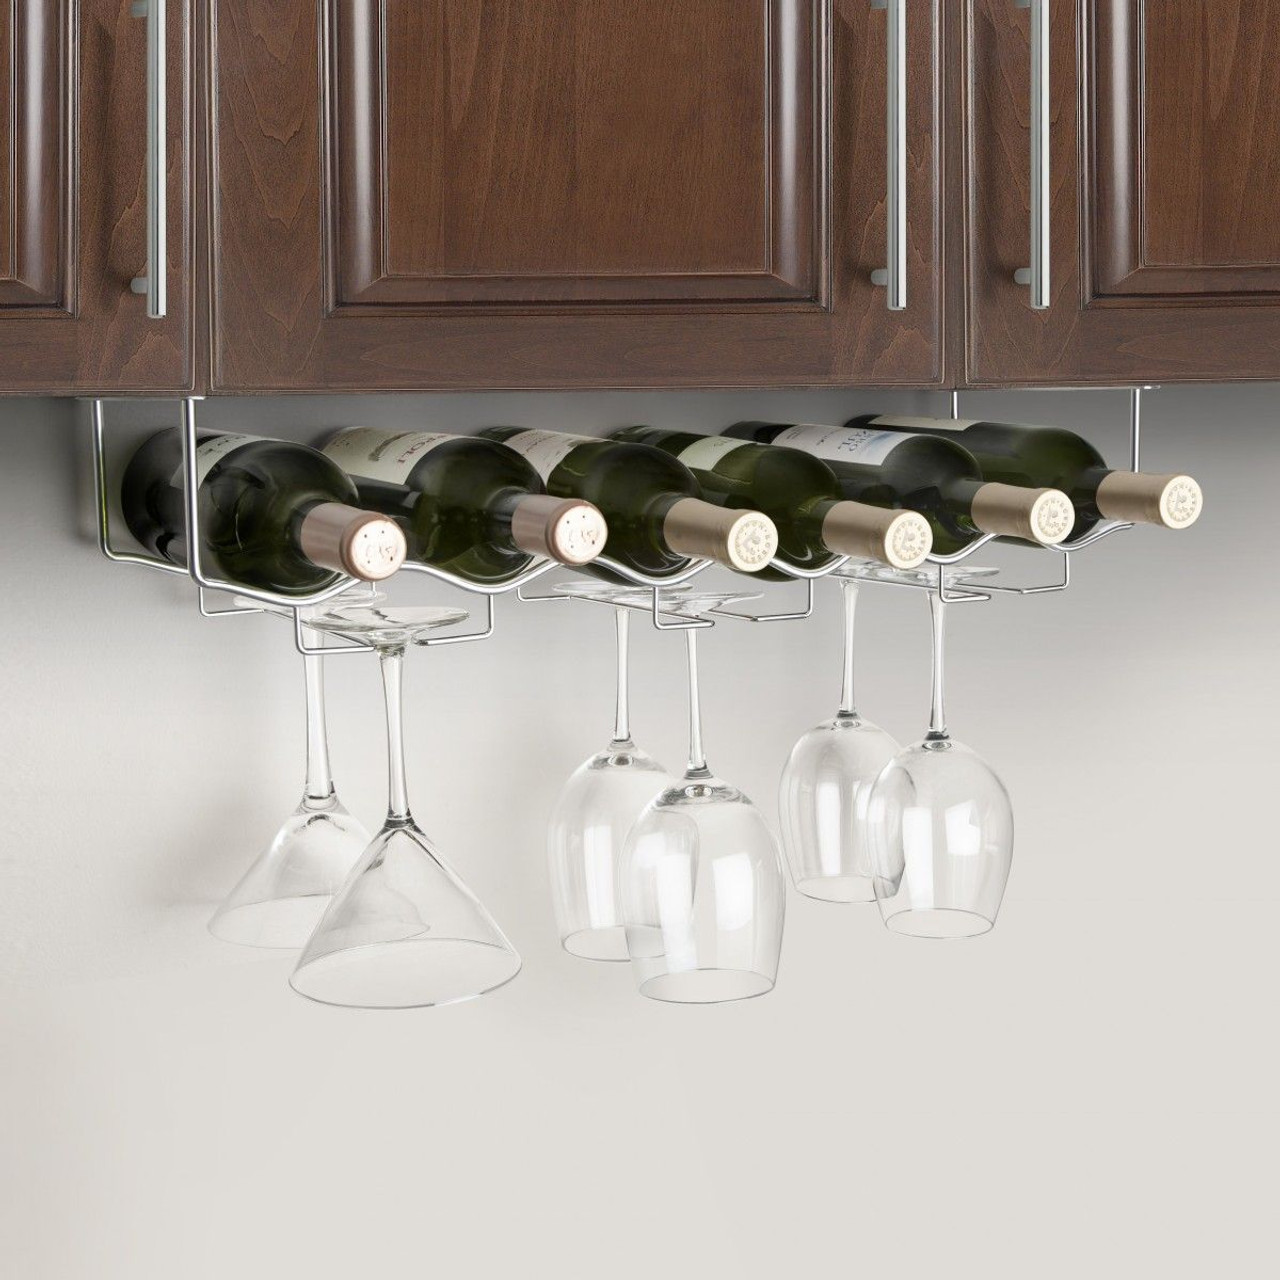 under cabinet 6 wine bottle 6 glass rack 3 channel stainless steel